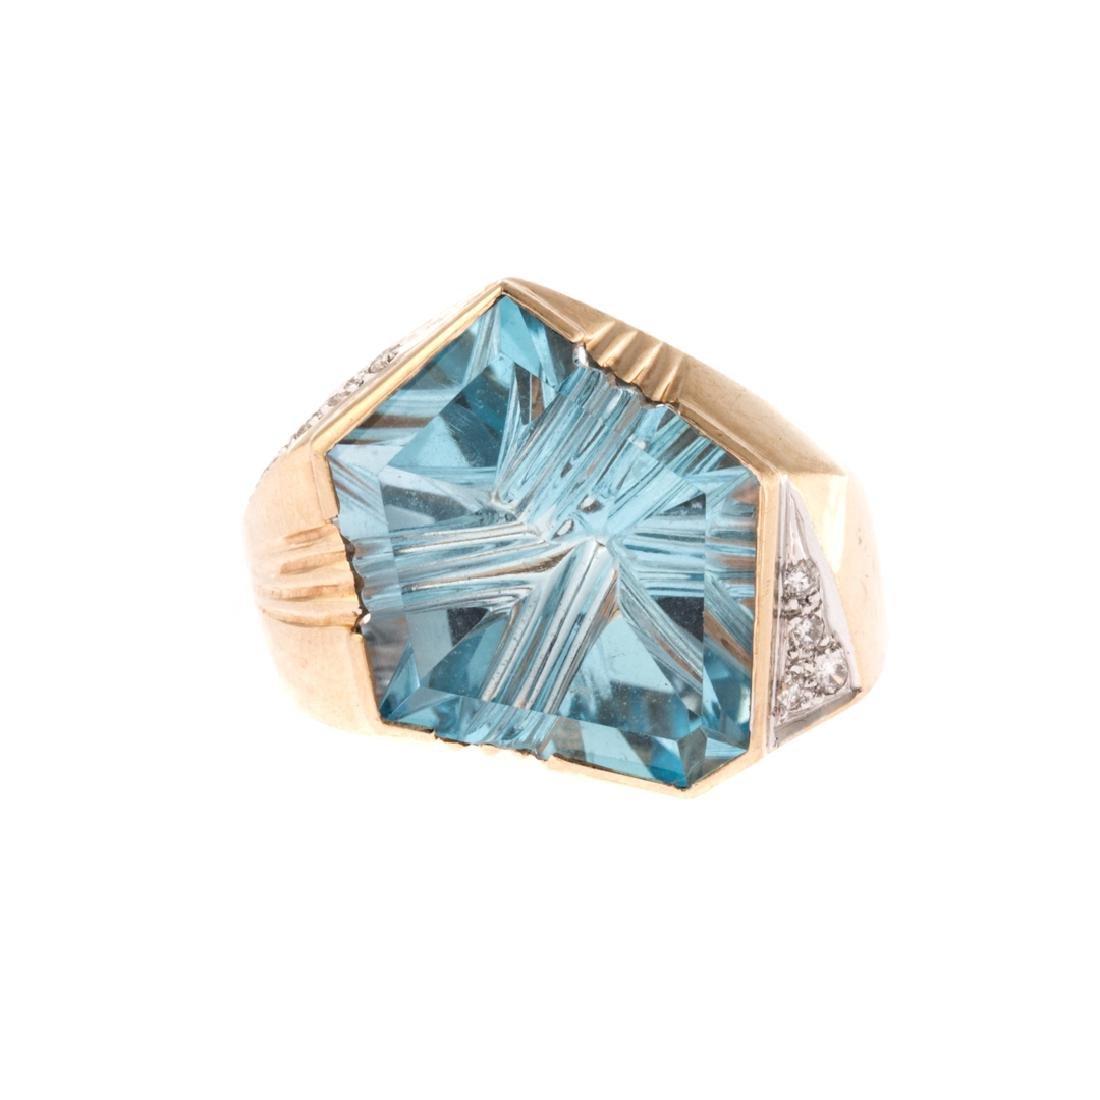 A Lady's Contemporary Blue Topaz & Diamond Ring